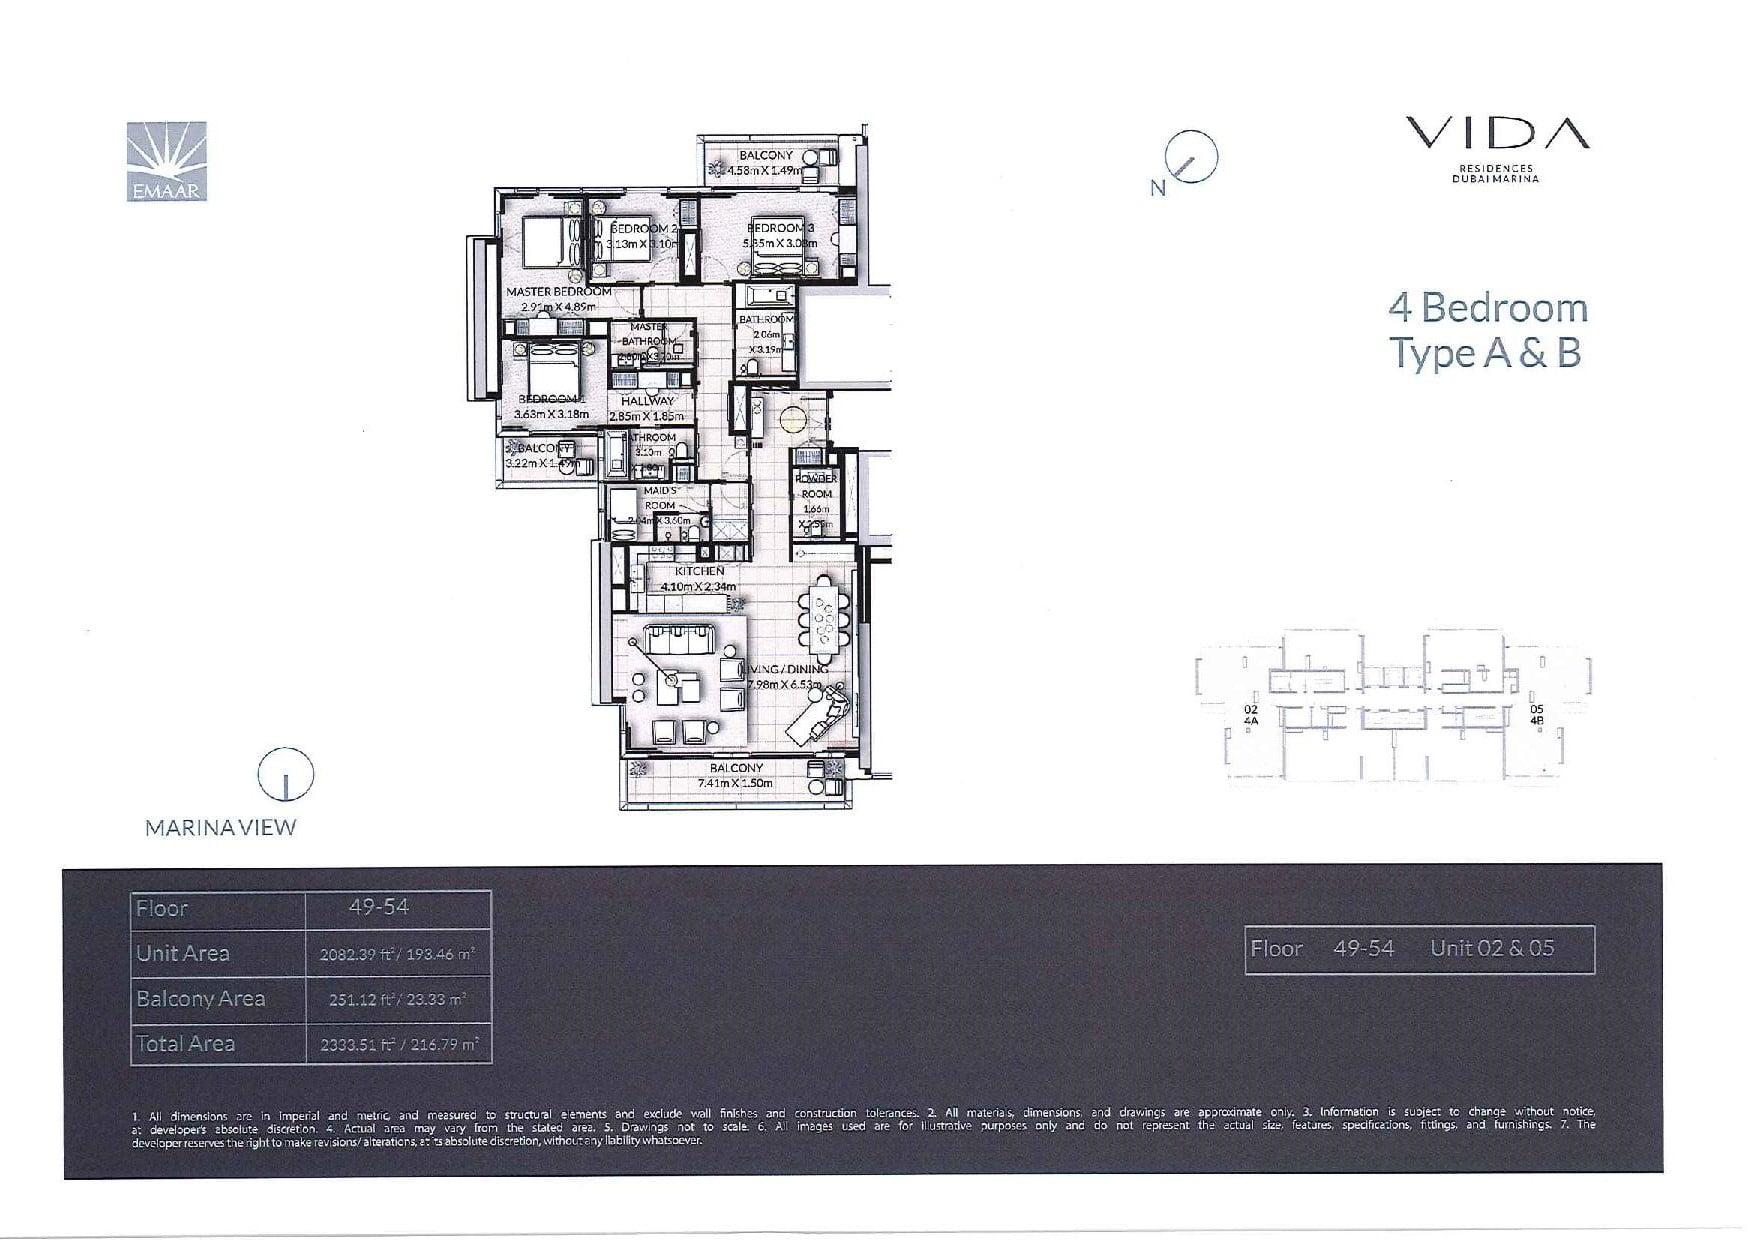 Vida Residences Floor Plans page 024 - Floor Plans - Vida Residences Dubai Marina